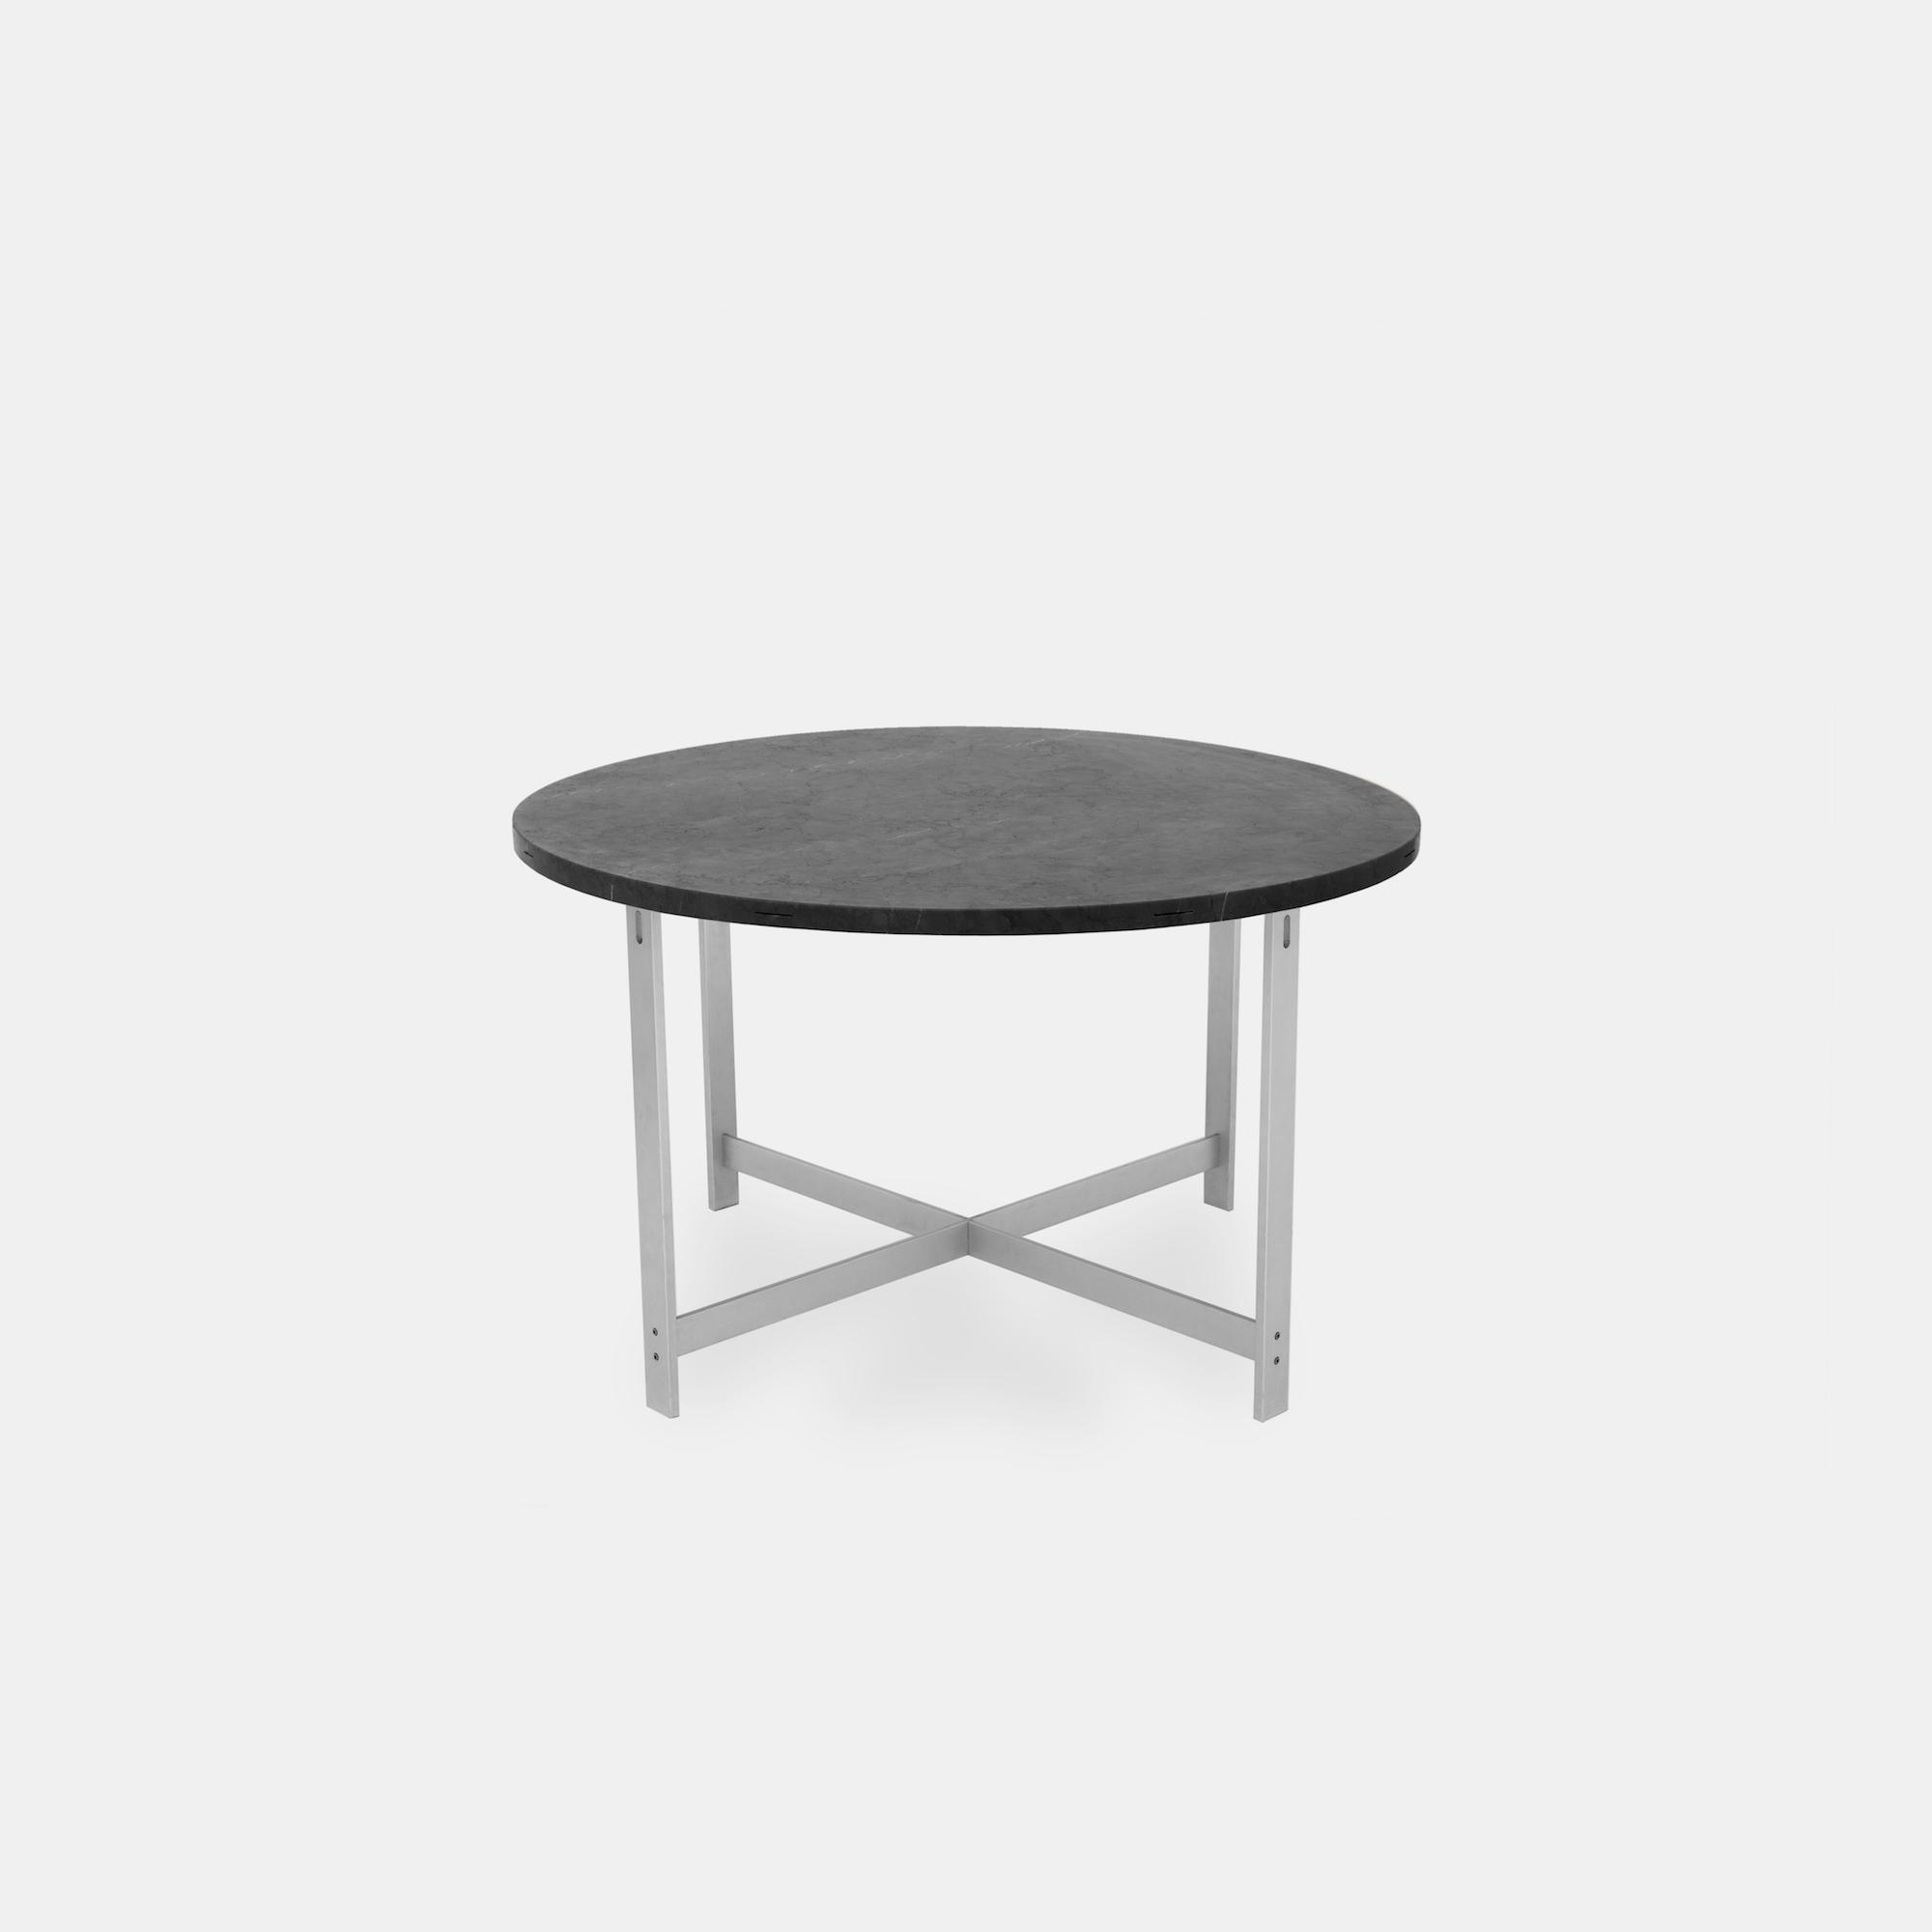 Klassik Studio JH Table - Black Marble